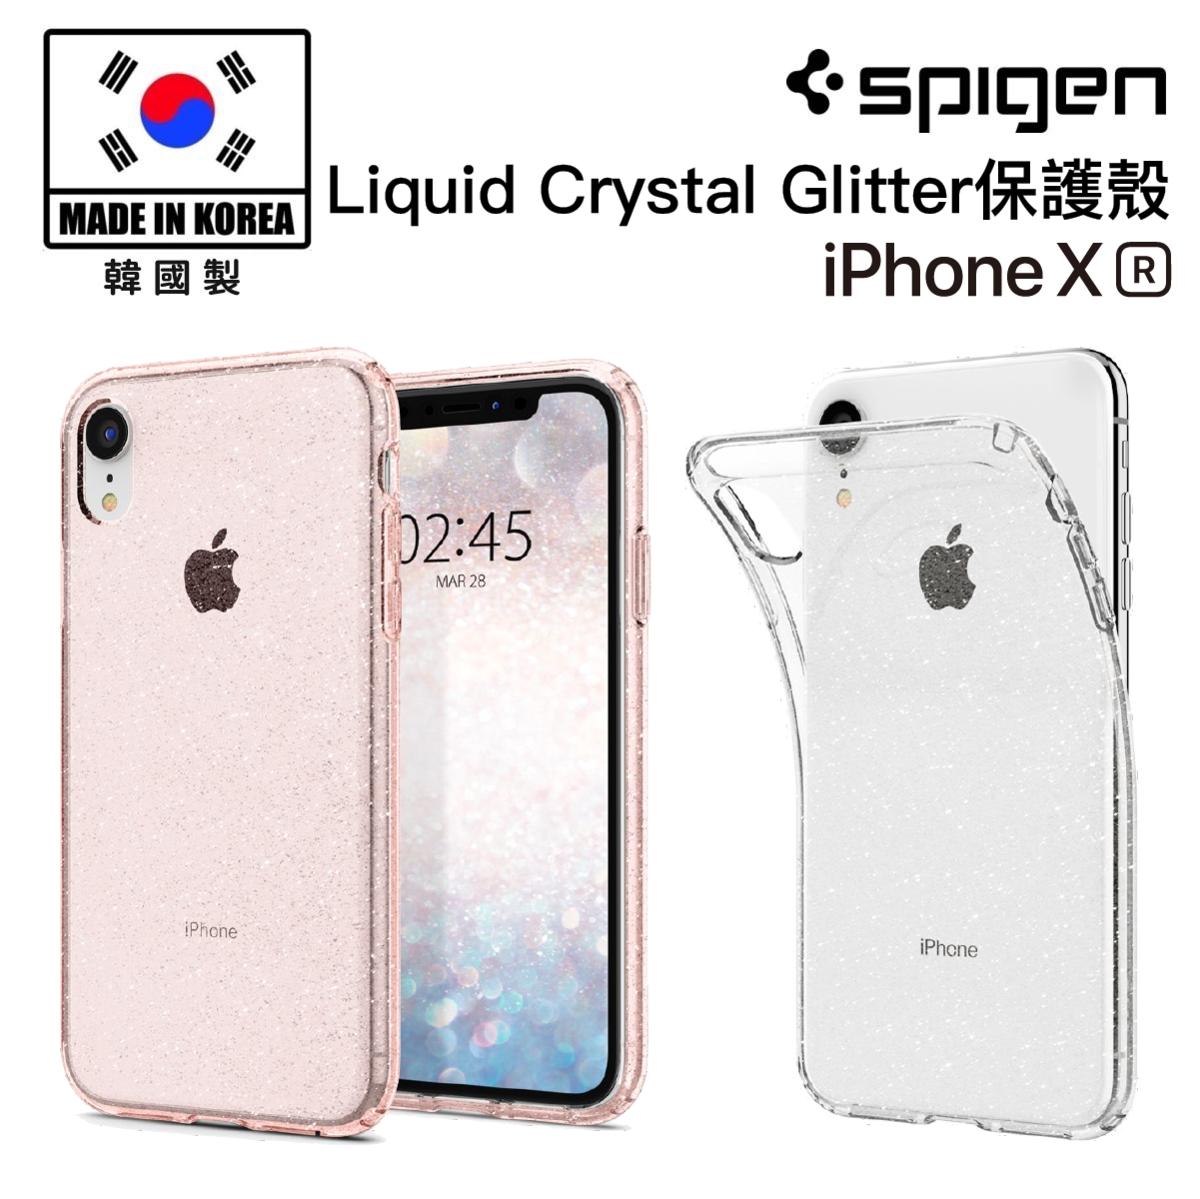 Spigen iPhone XR Liquid Crystal Glitter 保護殼 Clear